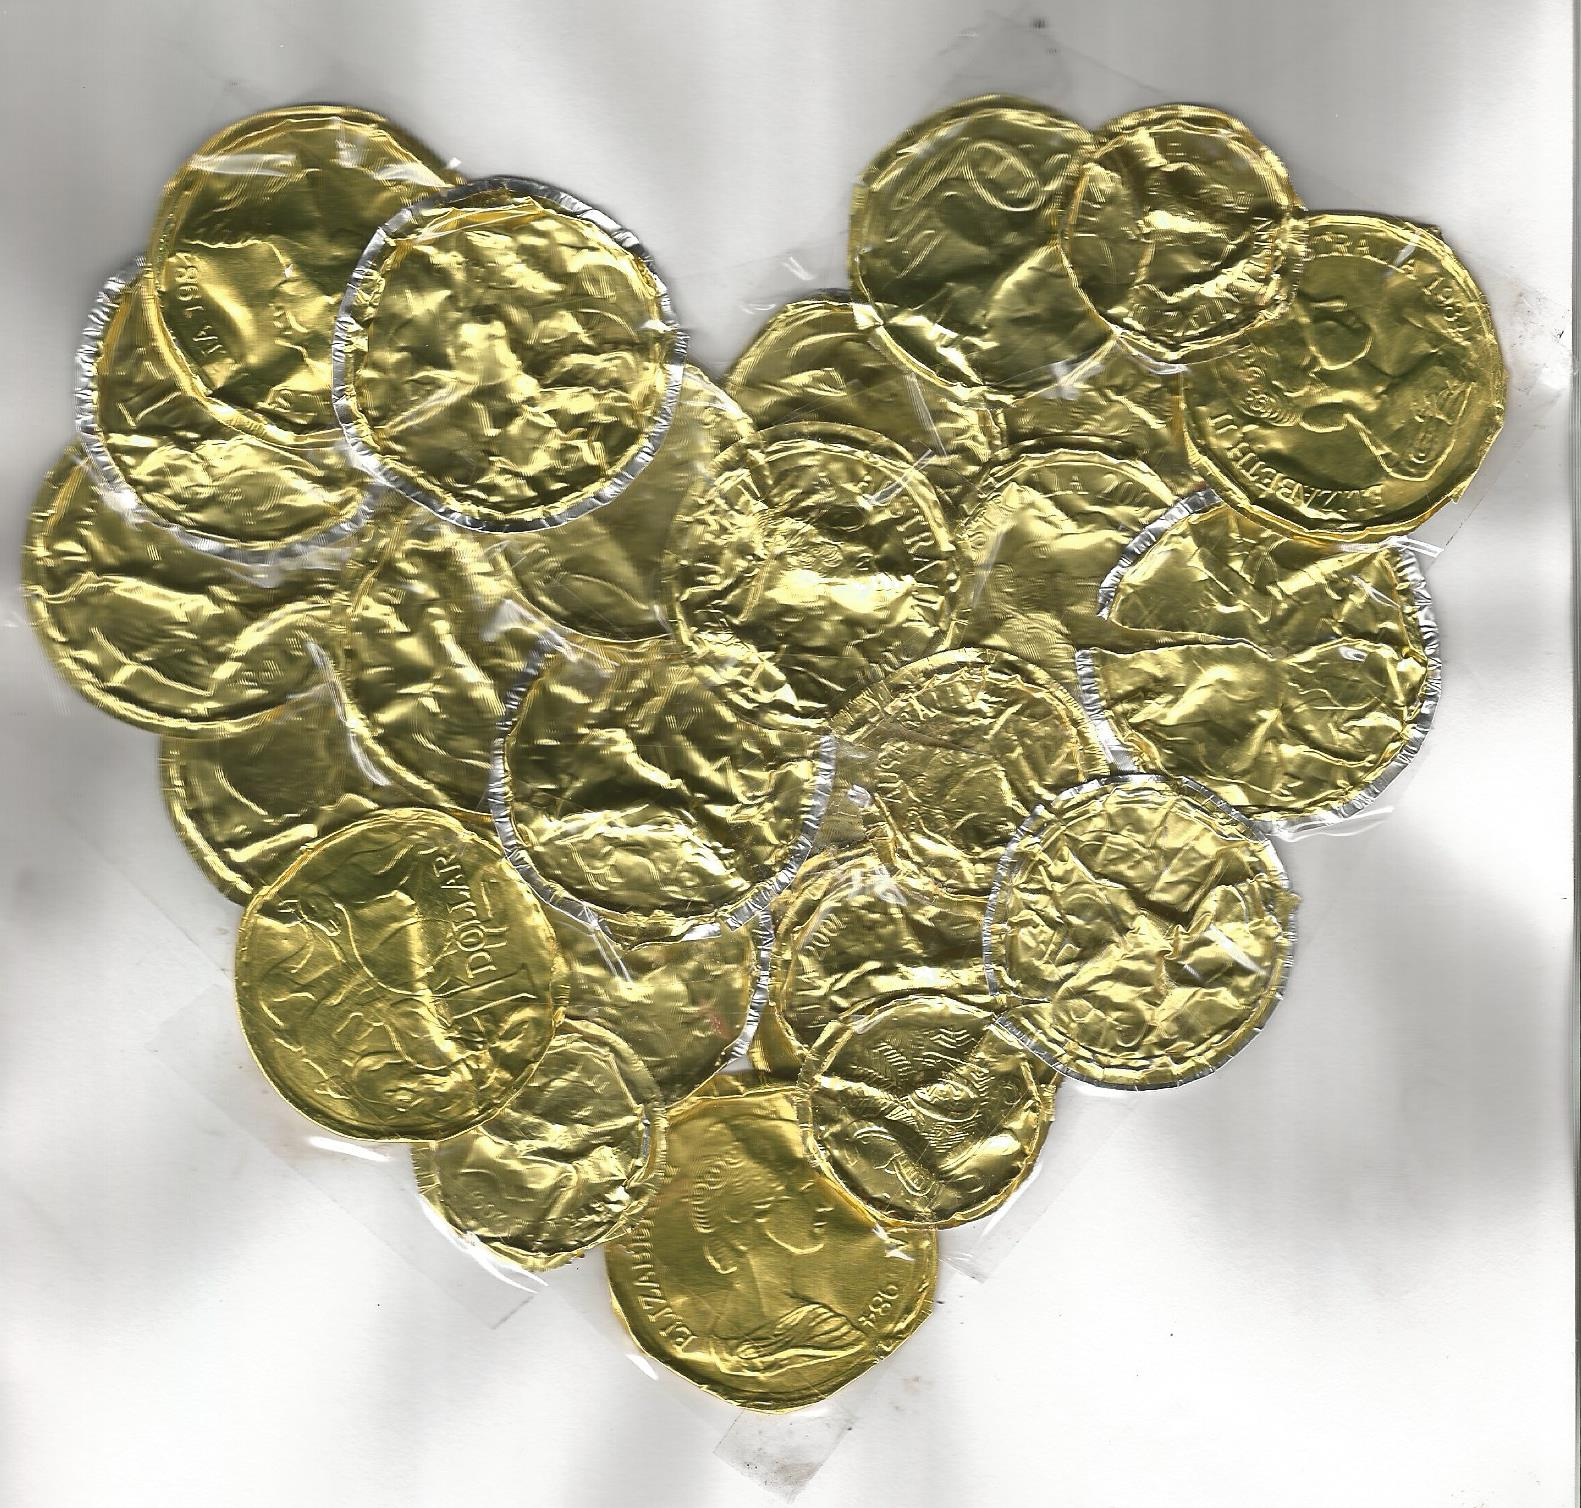 Gold Heart by Hot-Chelle-Raelian